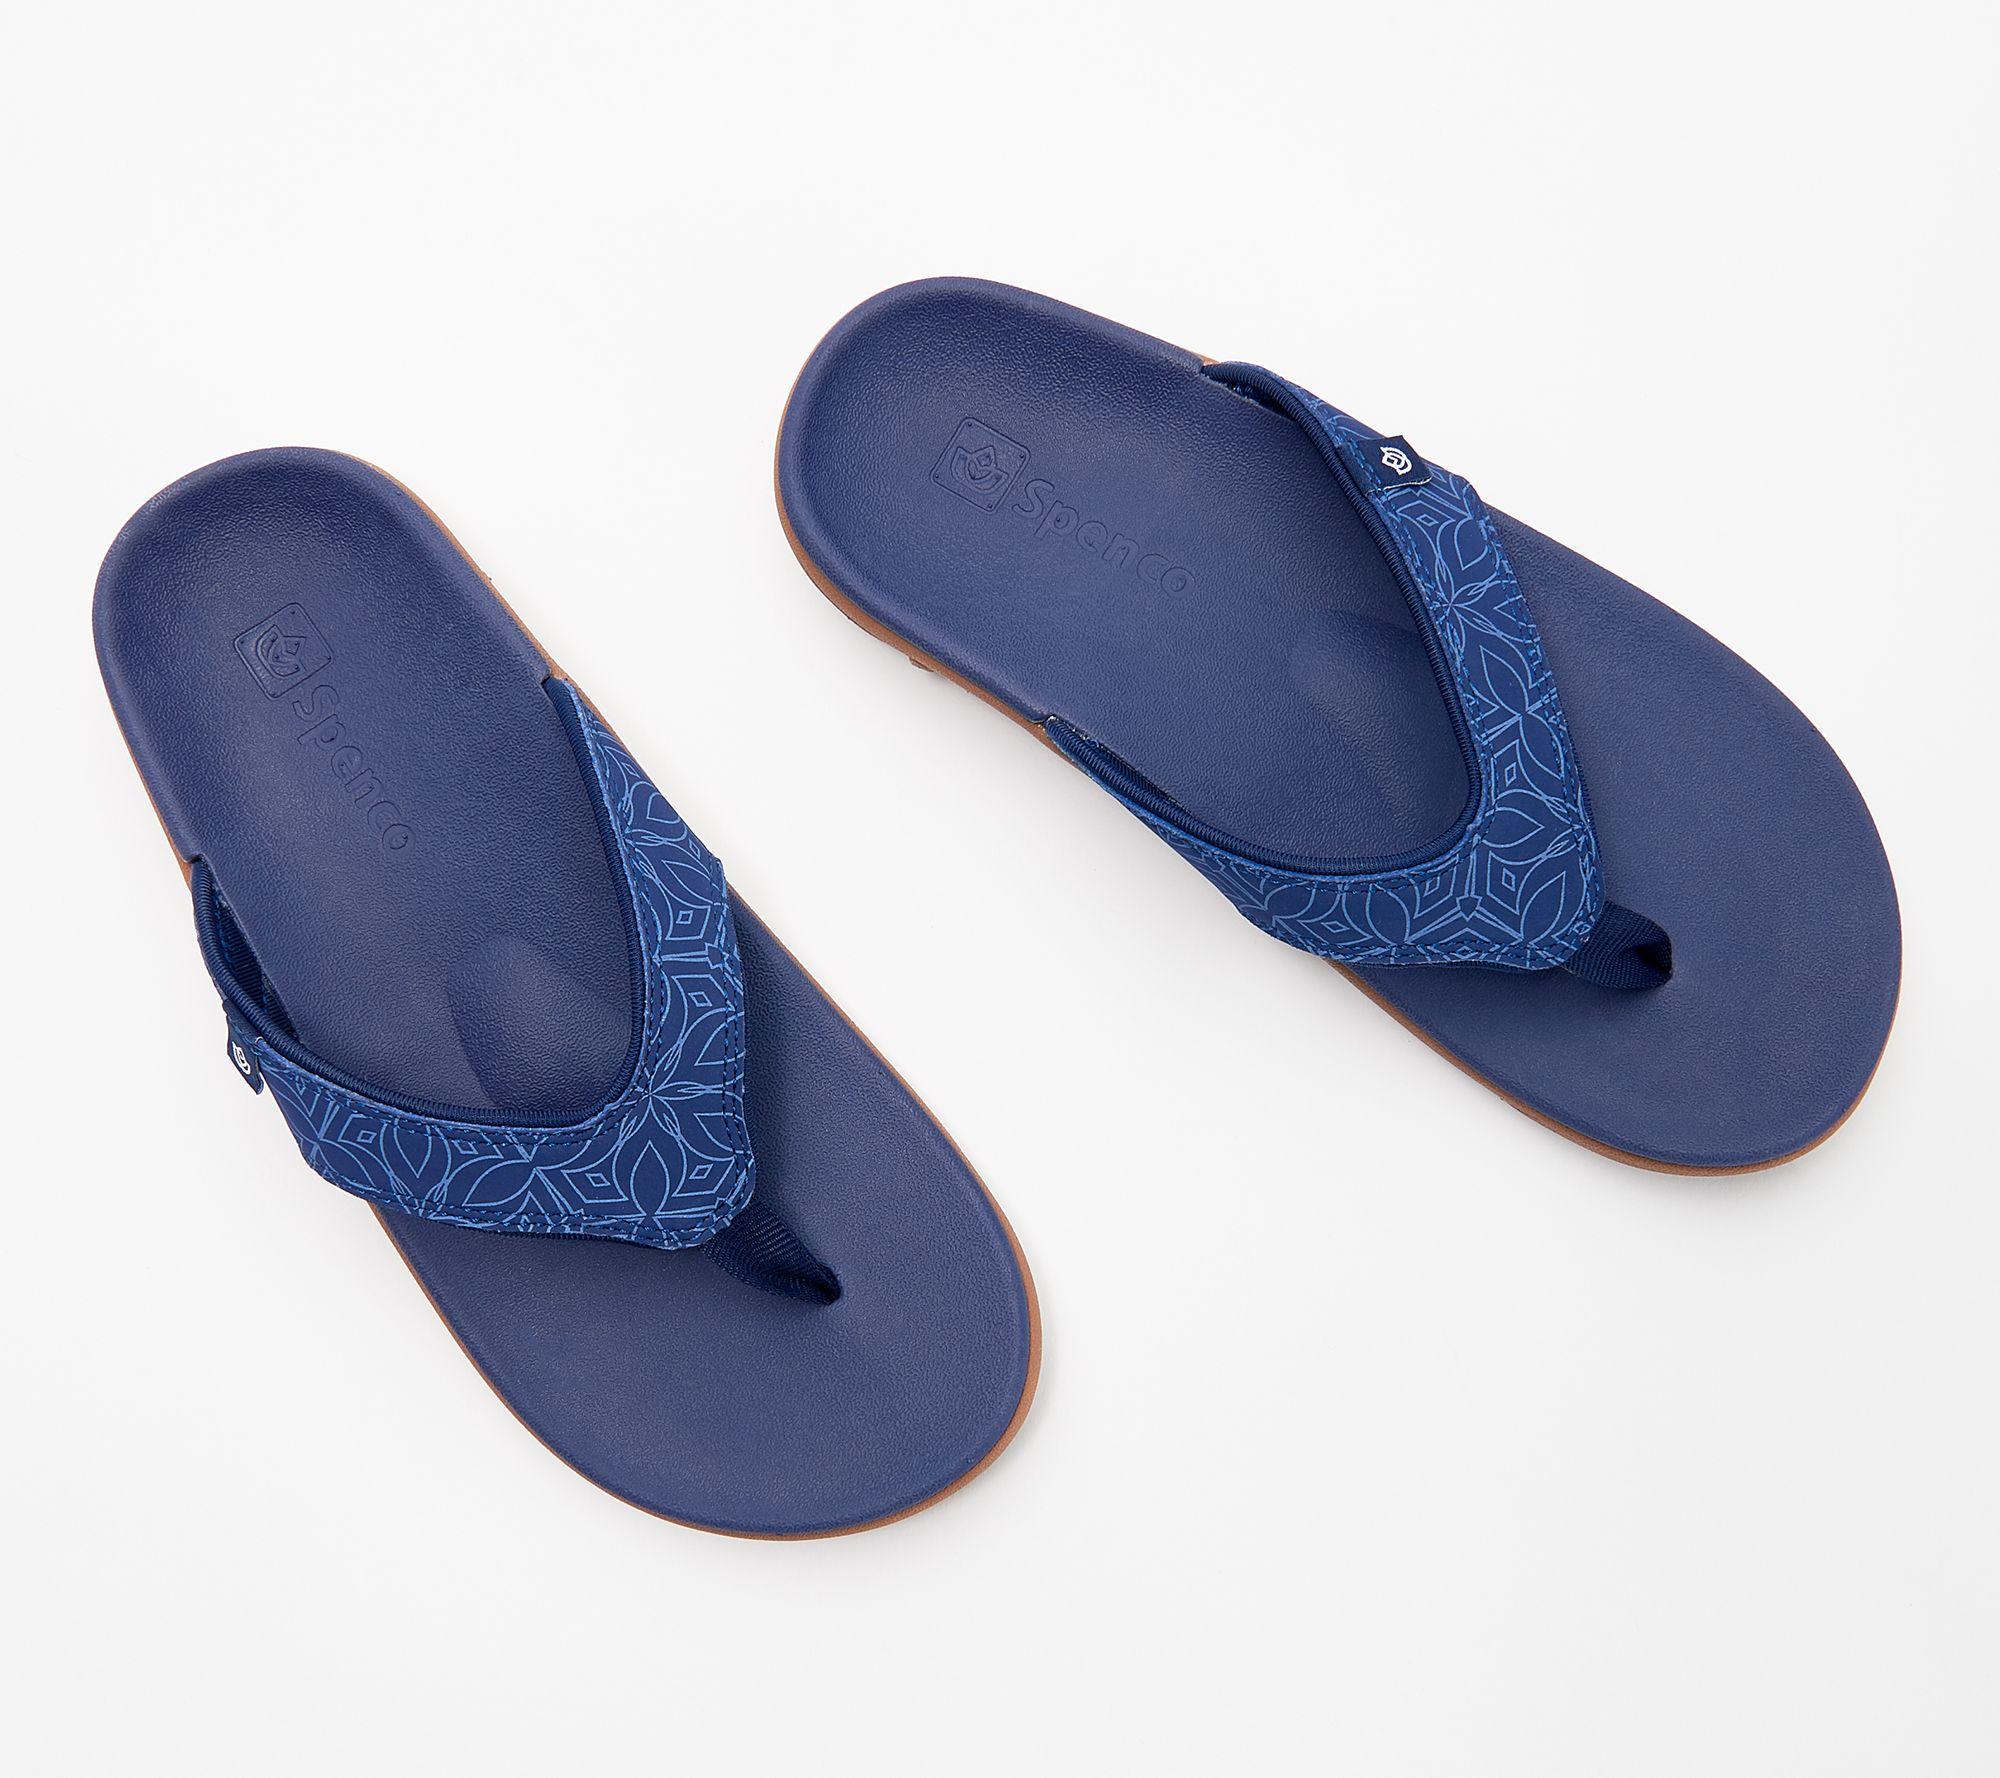 All Sizes Spenco Yumi Men/'s Orthotic Flip Flops All Colors